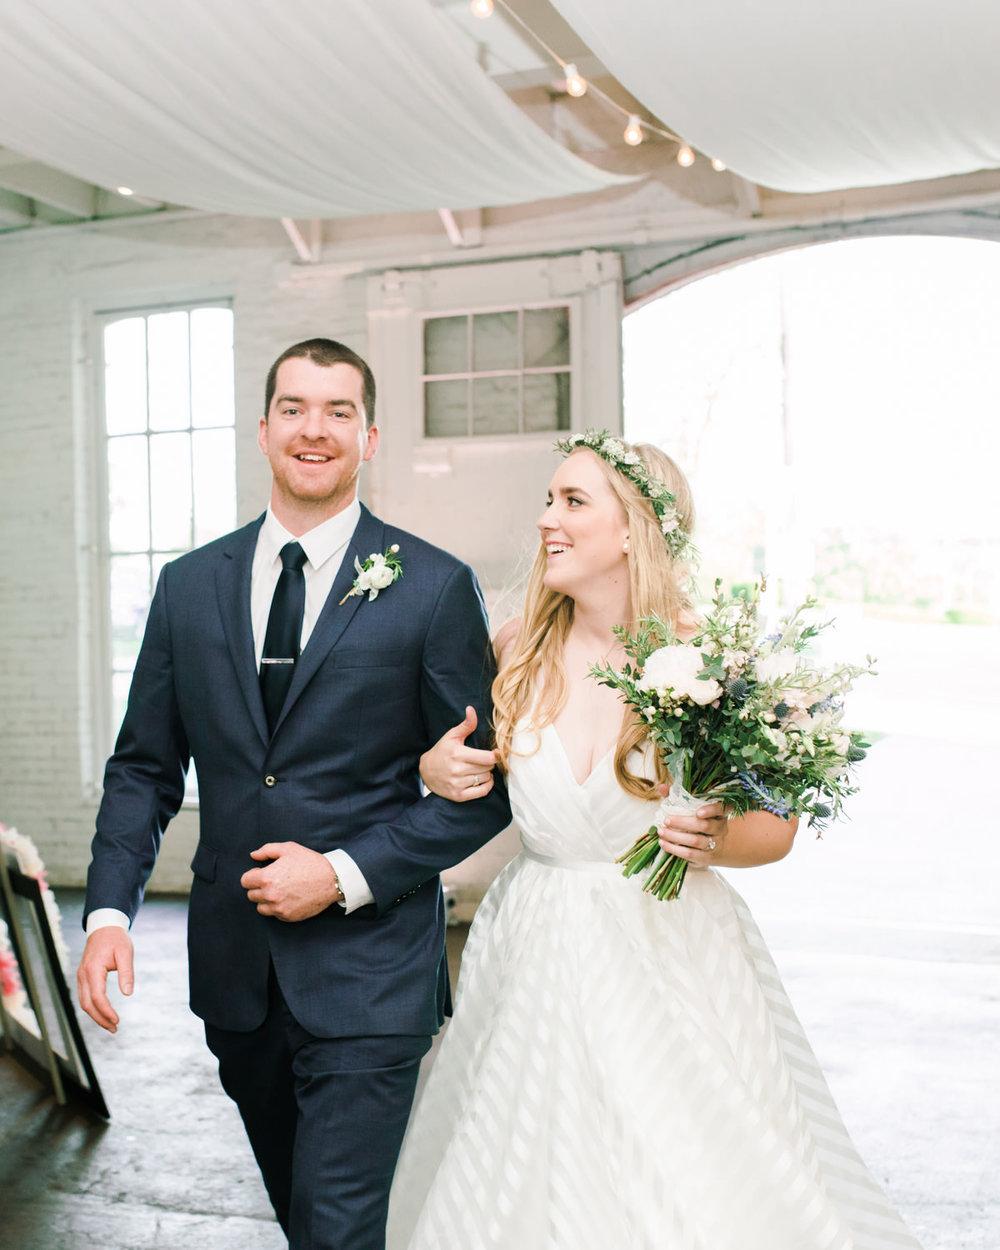 Steeler's Football Player Jordan Berry & Emily Berry Round Barn Wedding-84.jpg